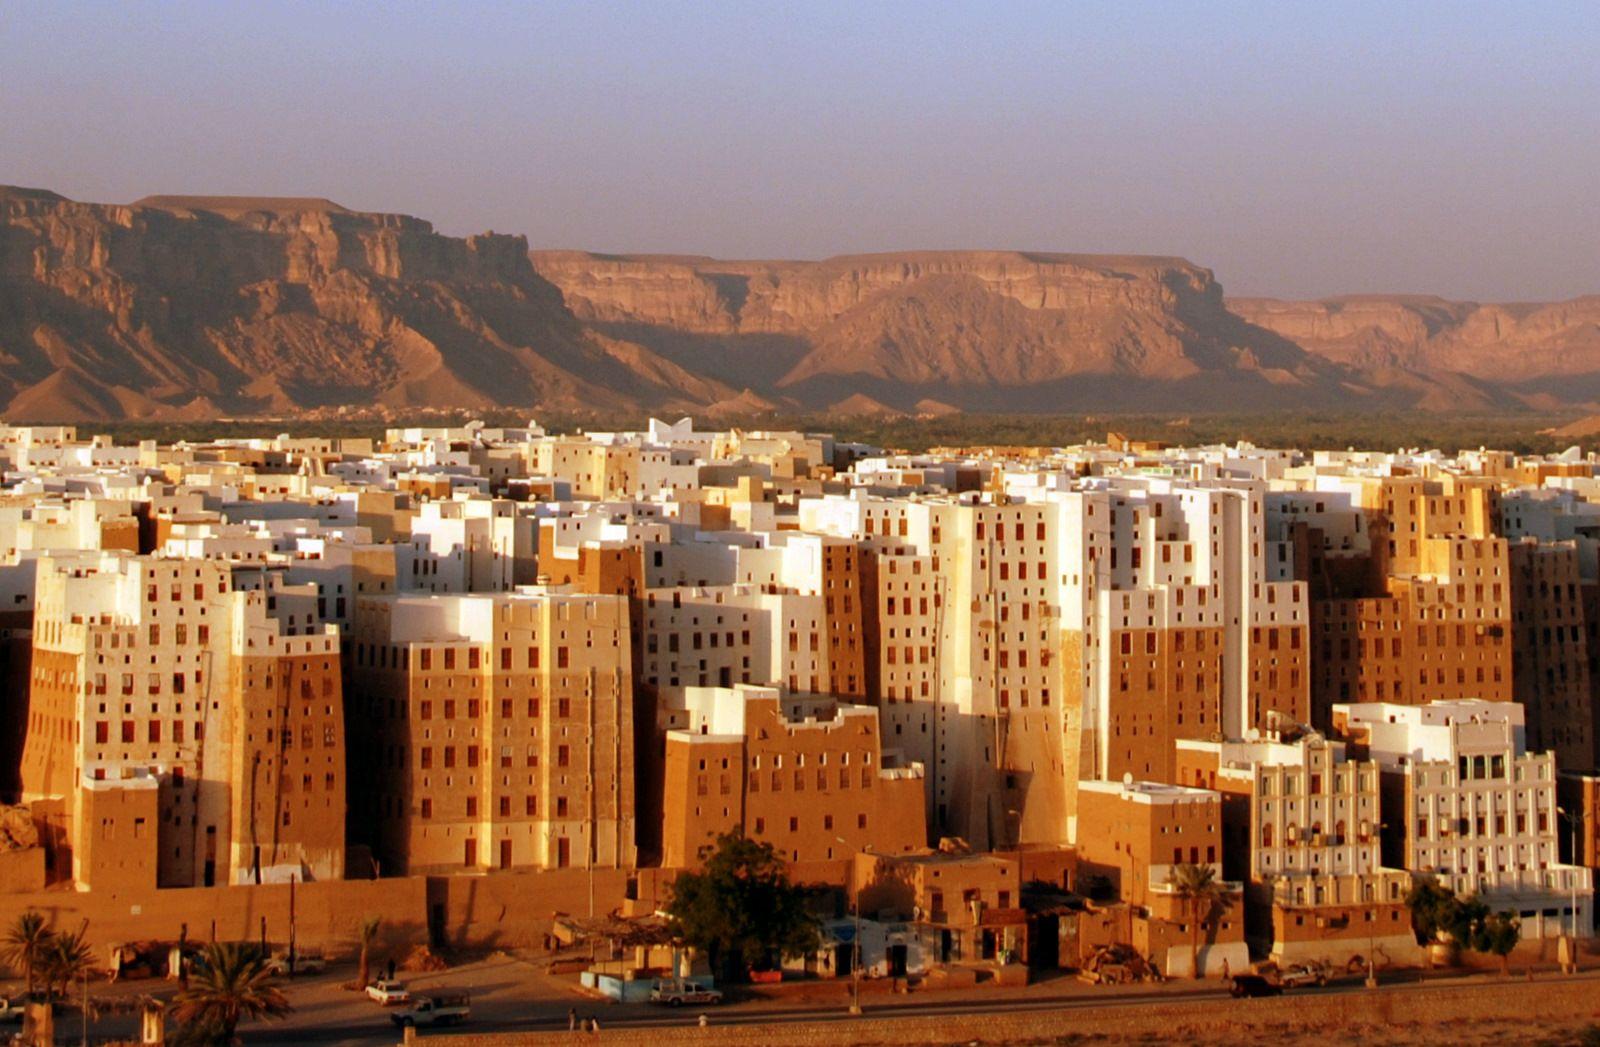 Middle East Impressions - Manhattan of Yemen = Shibam